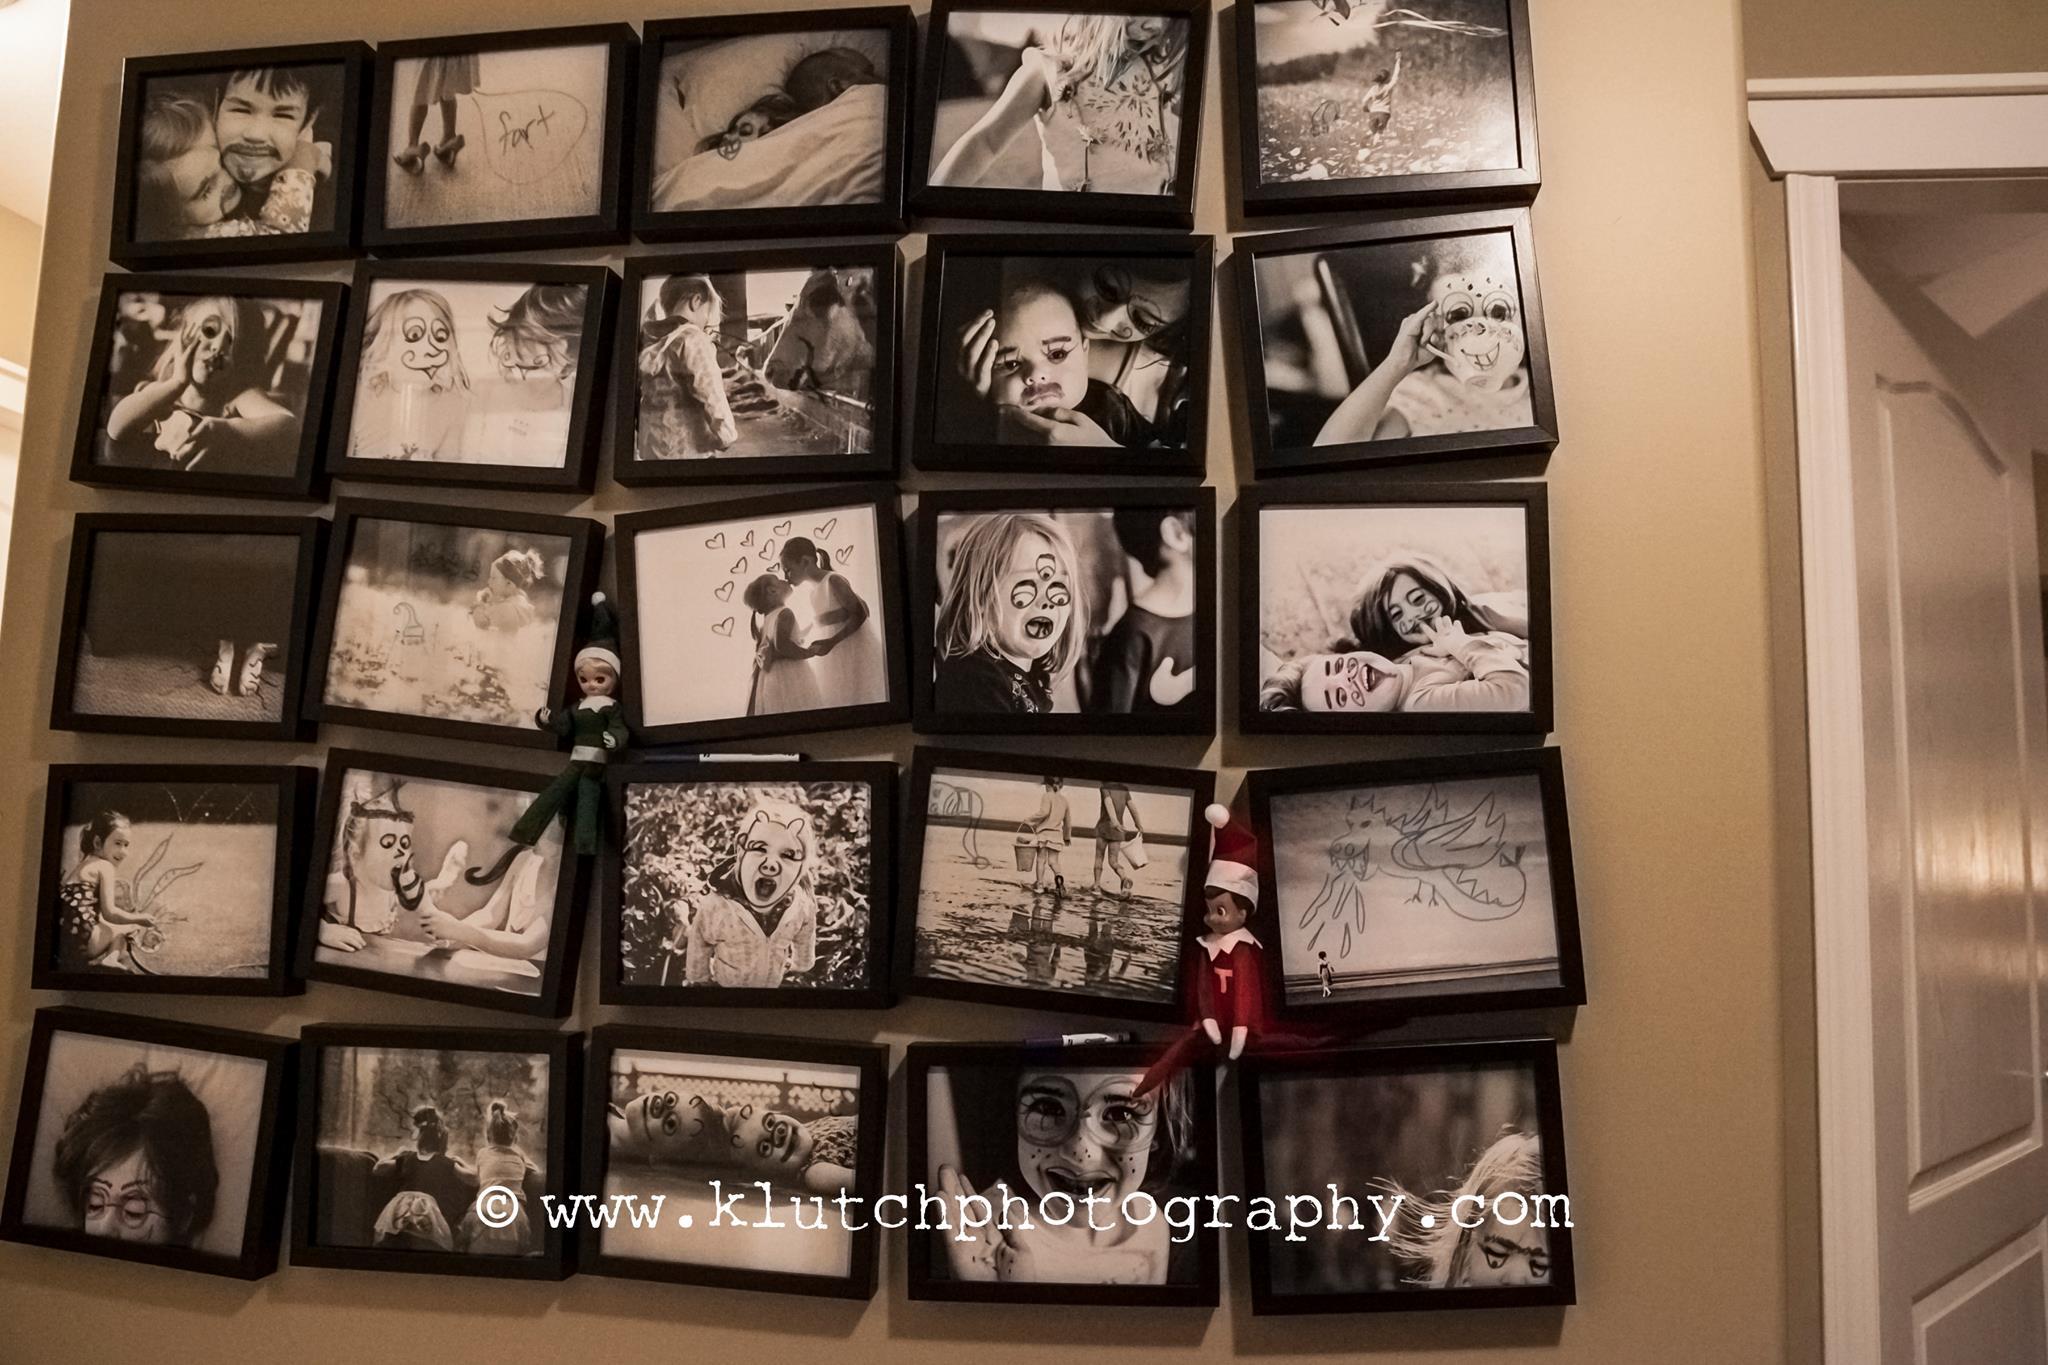 Klutch Photography, family photographer, elf on the shelf, vancouver family photographer, whiterock family photographer, lifeunscripted photographer, lifestlye photographer n.jpg